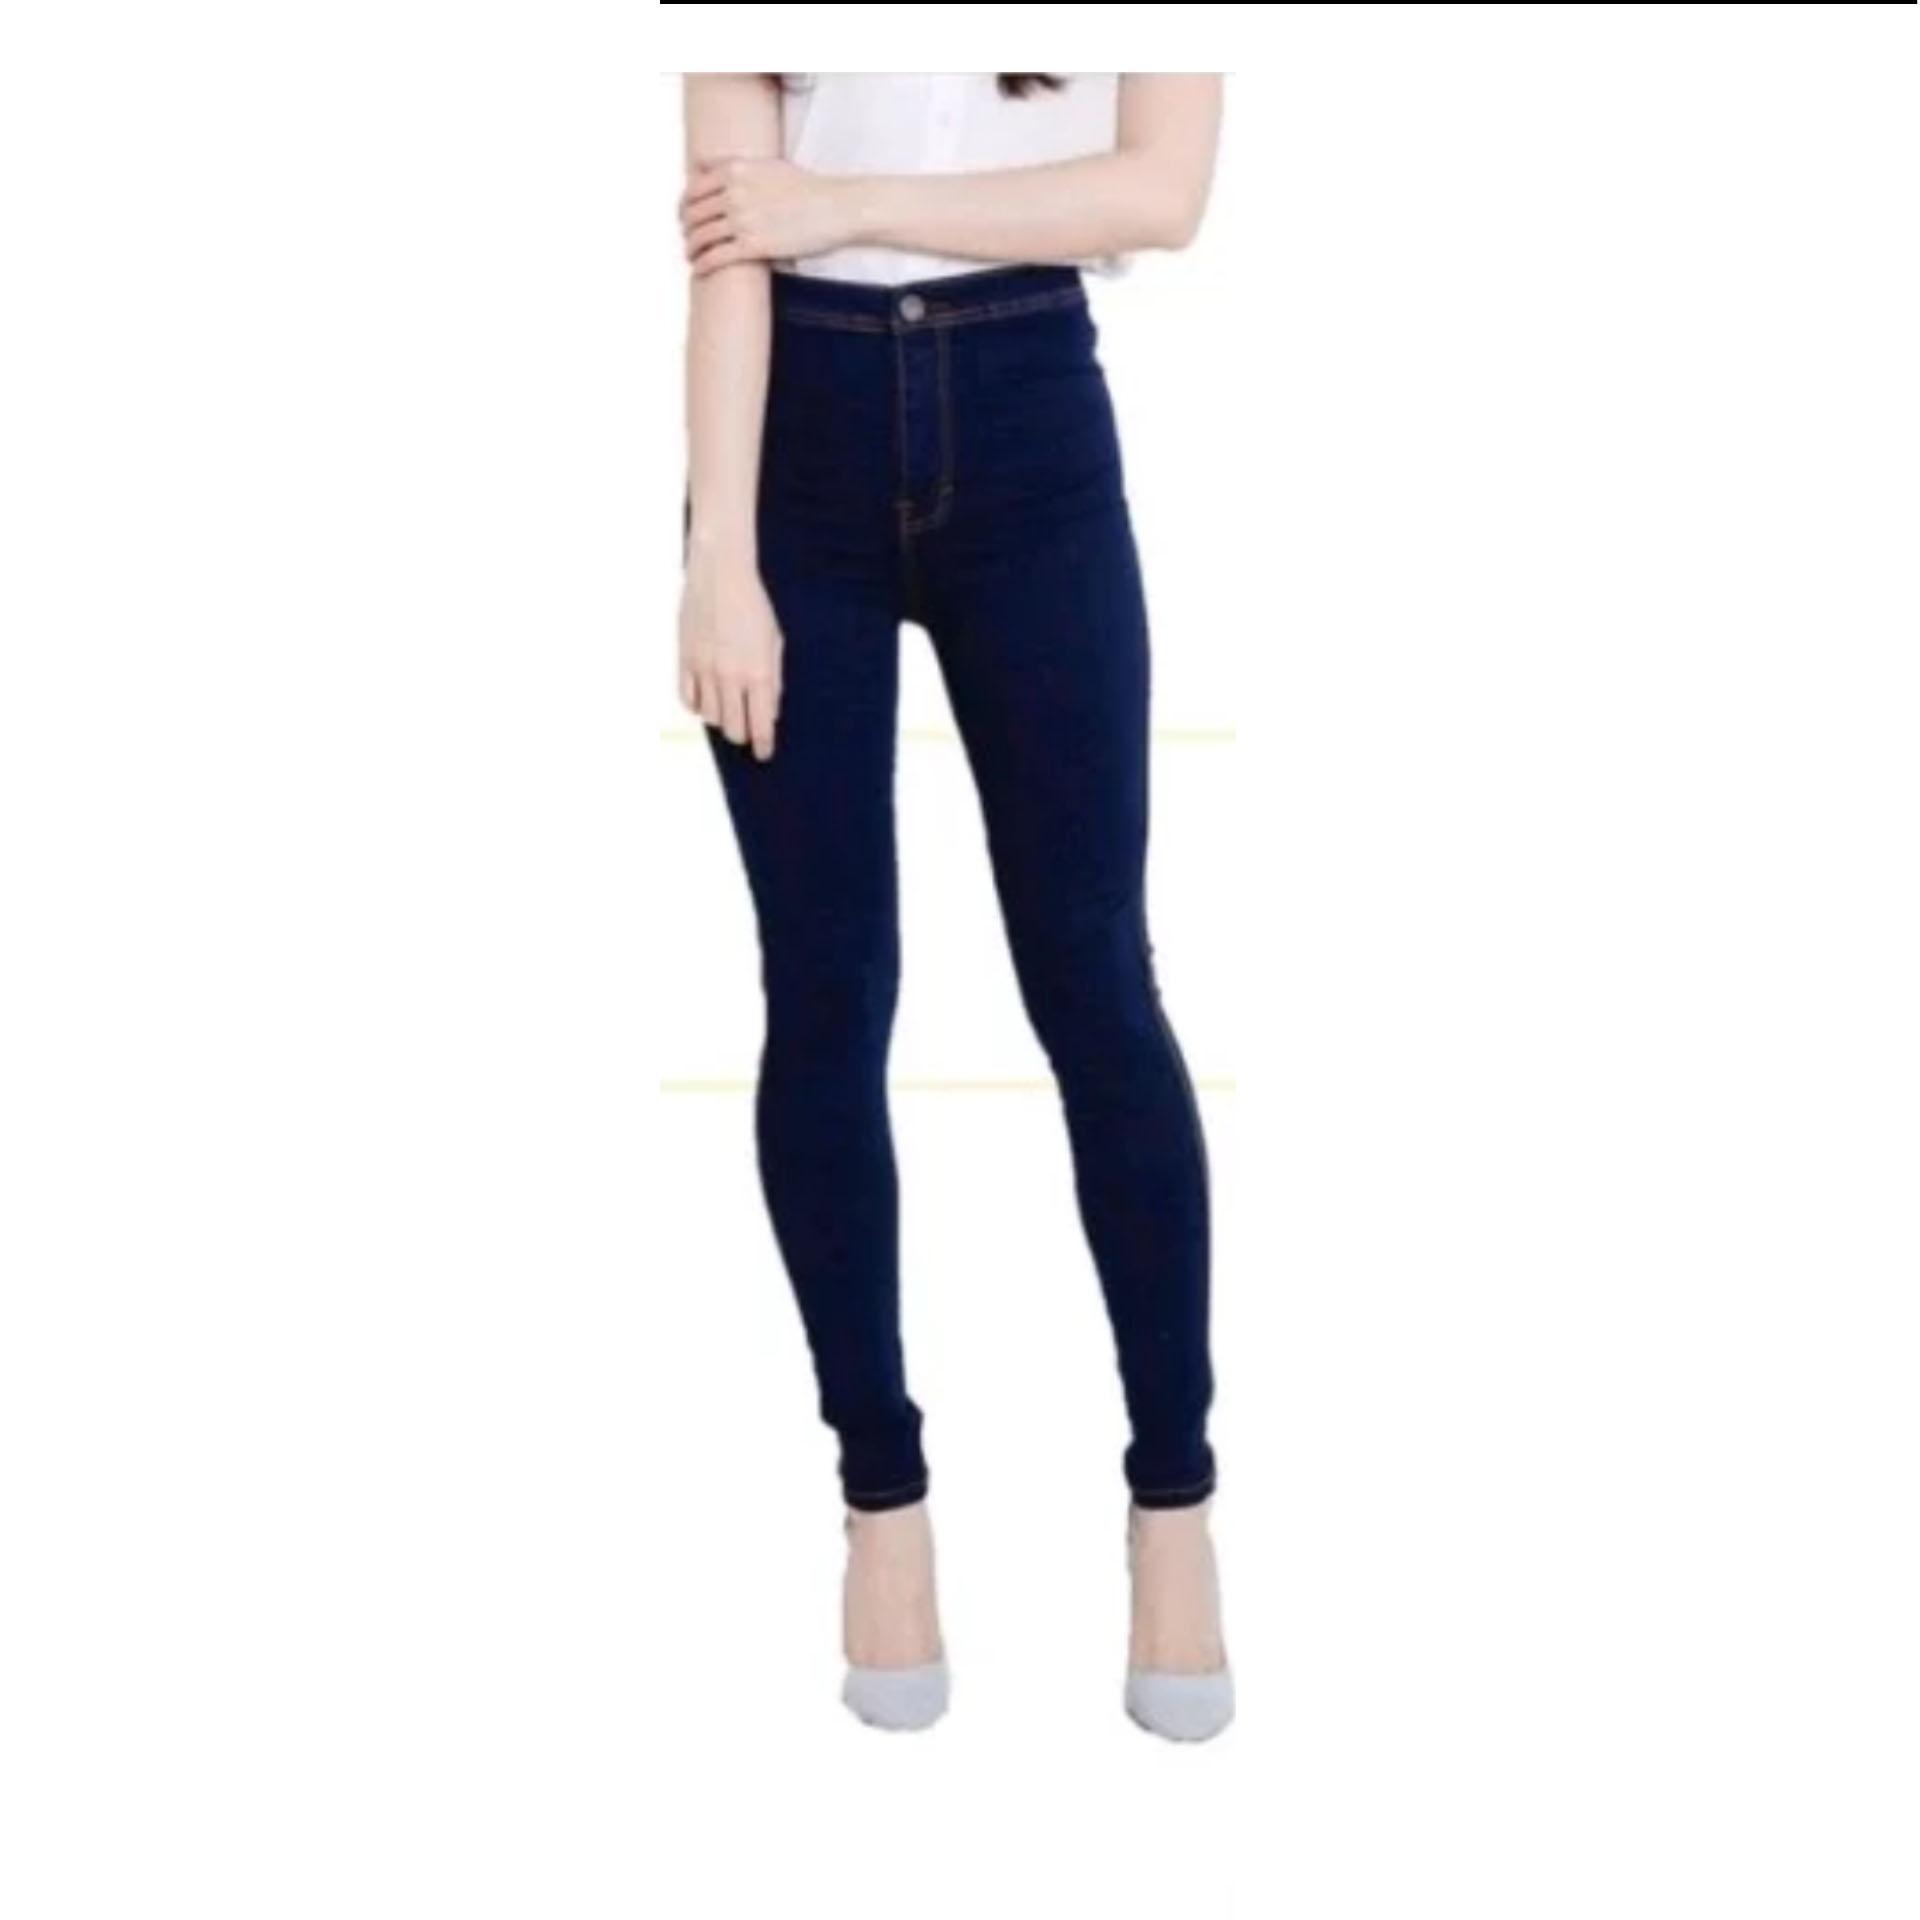 celana jeans highwaist wanita   highwaist termurah   polos 3052ba4bf5